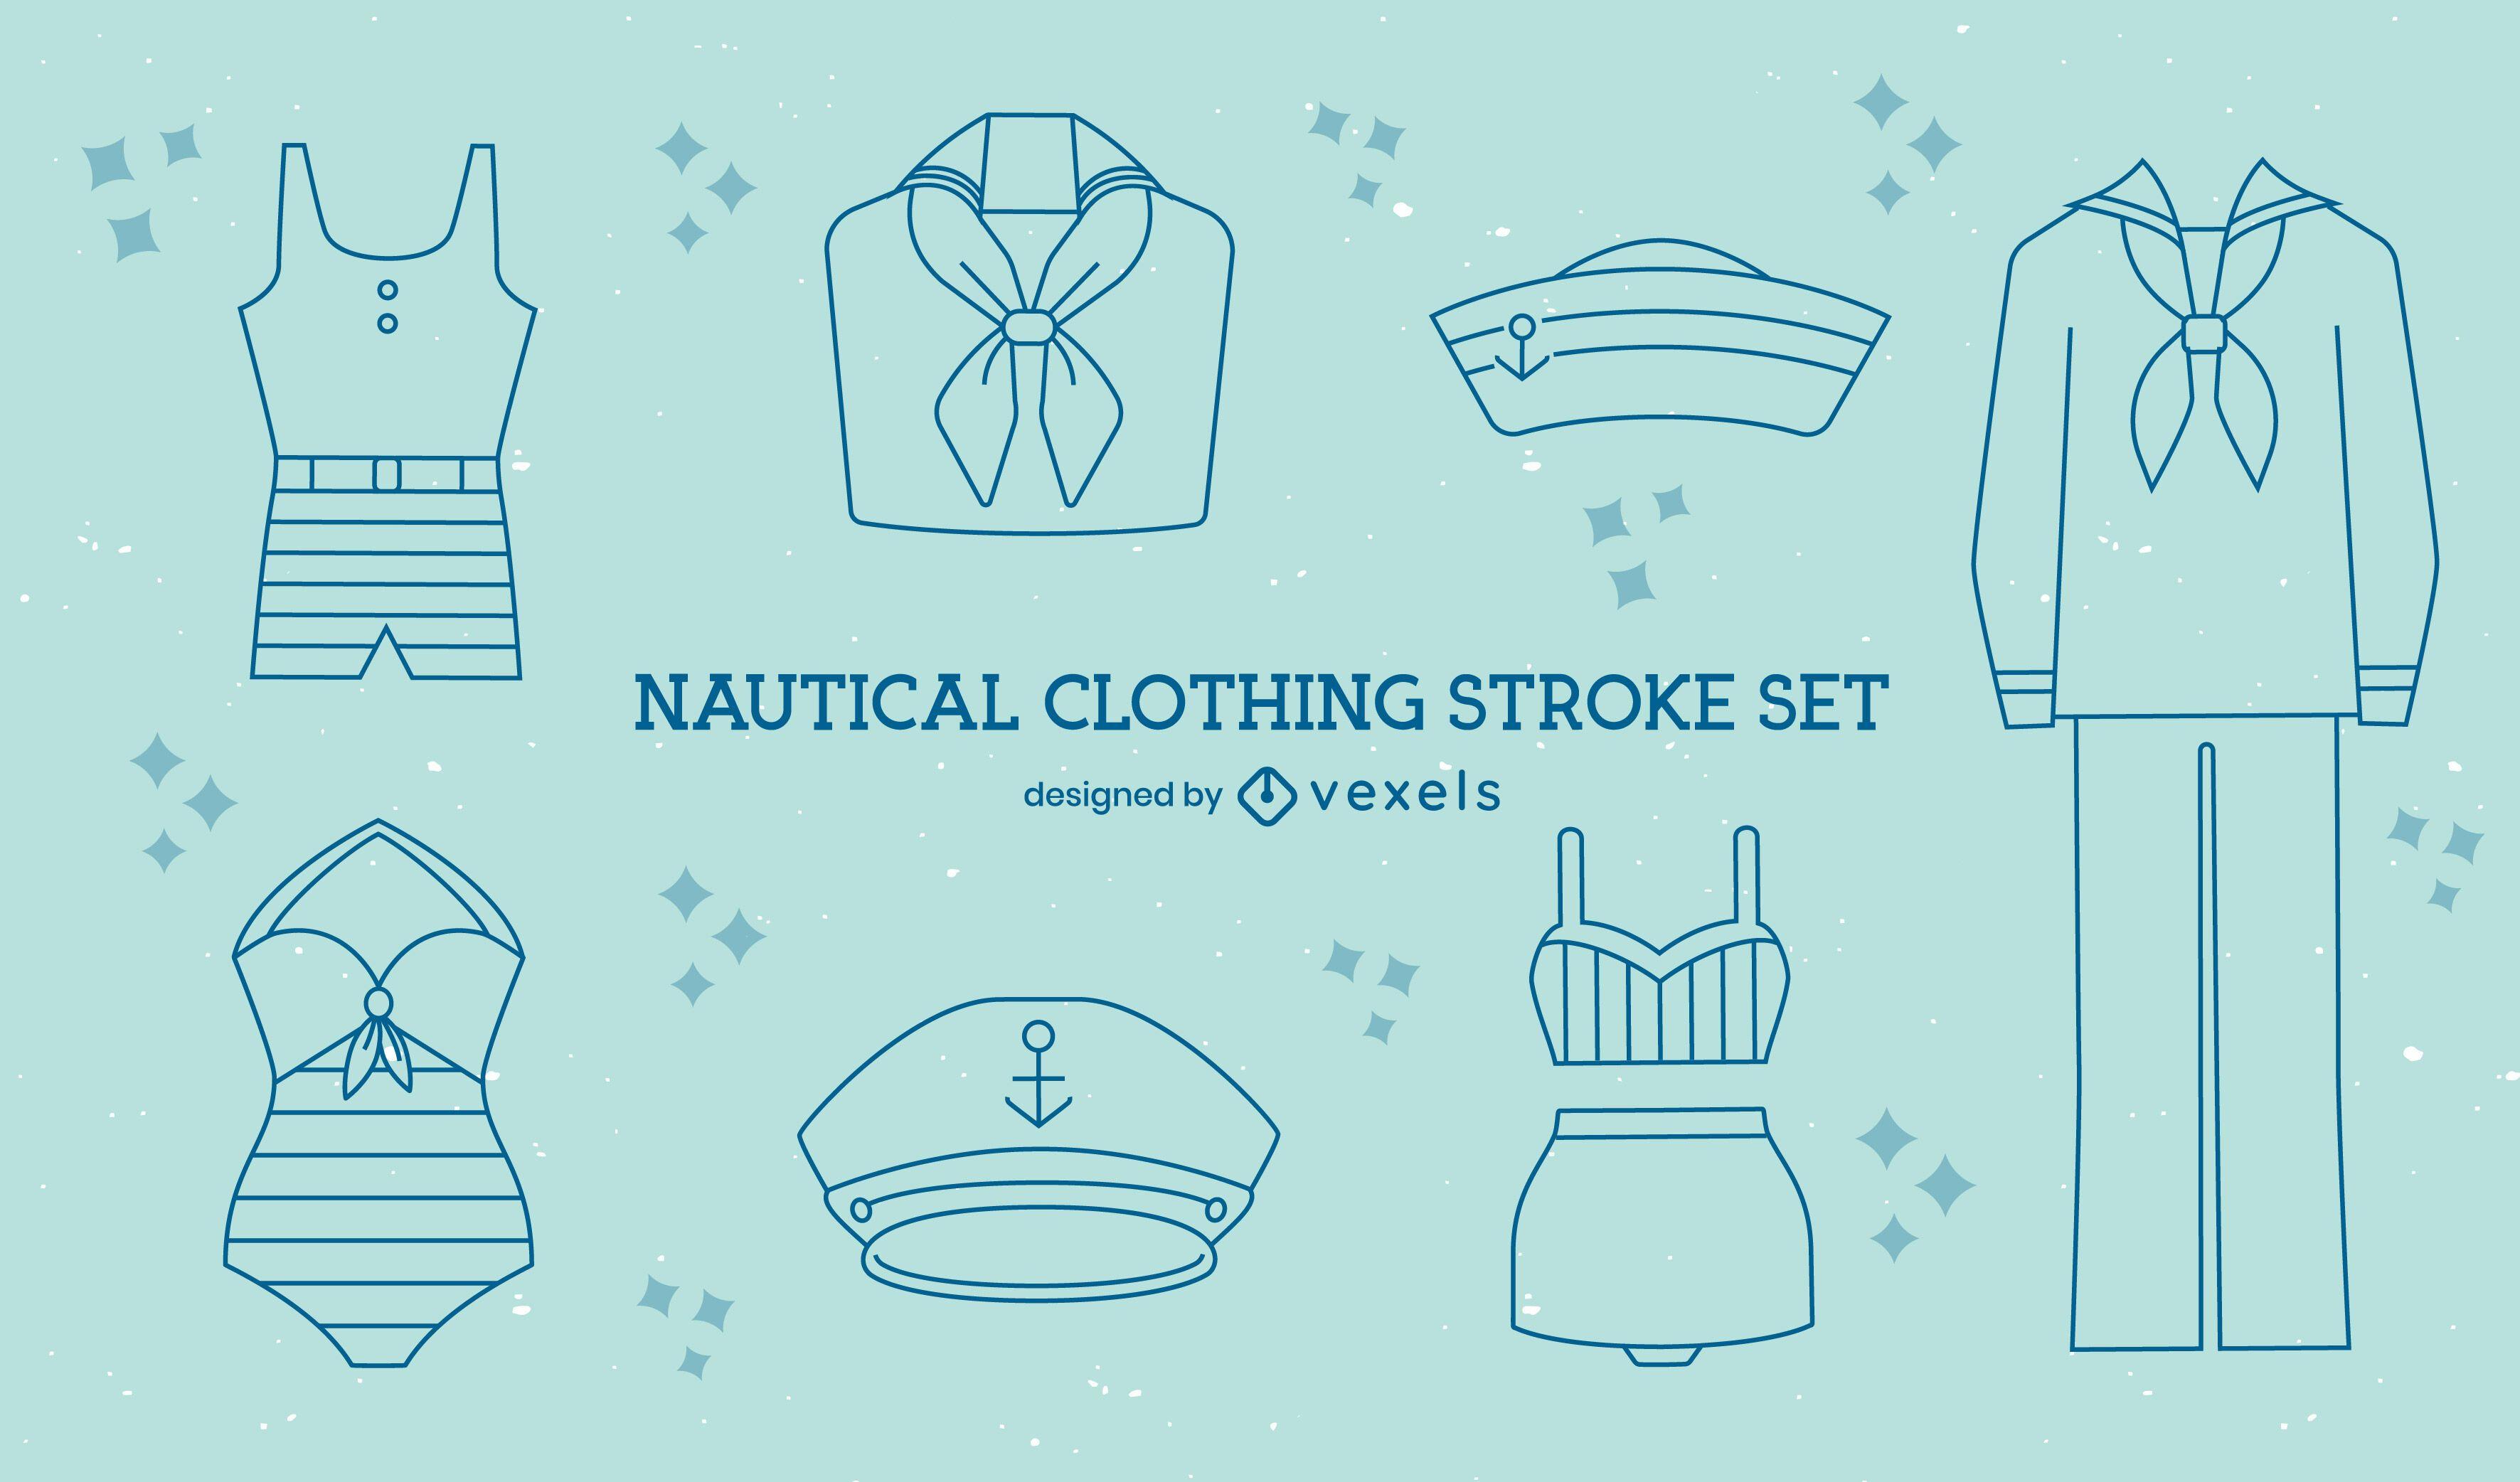 Conjunto de arte náutica de roupas vintage de marinheiro